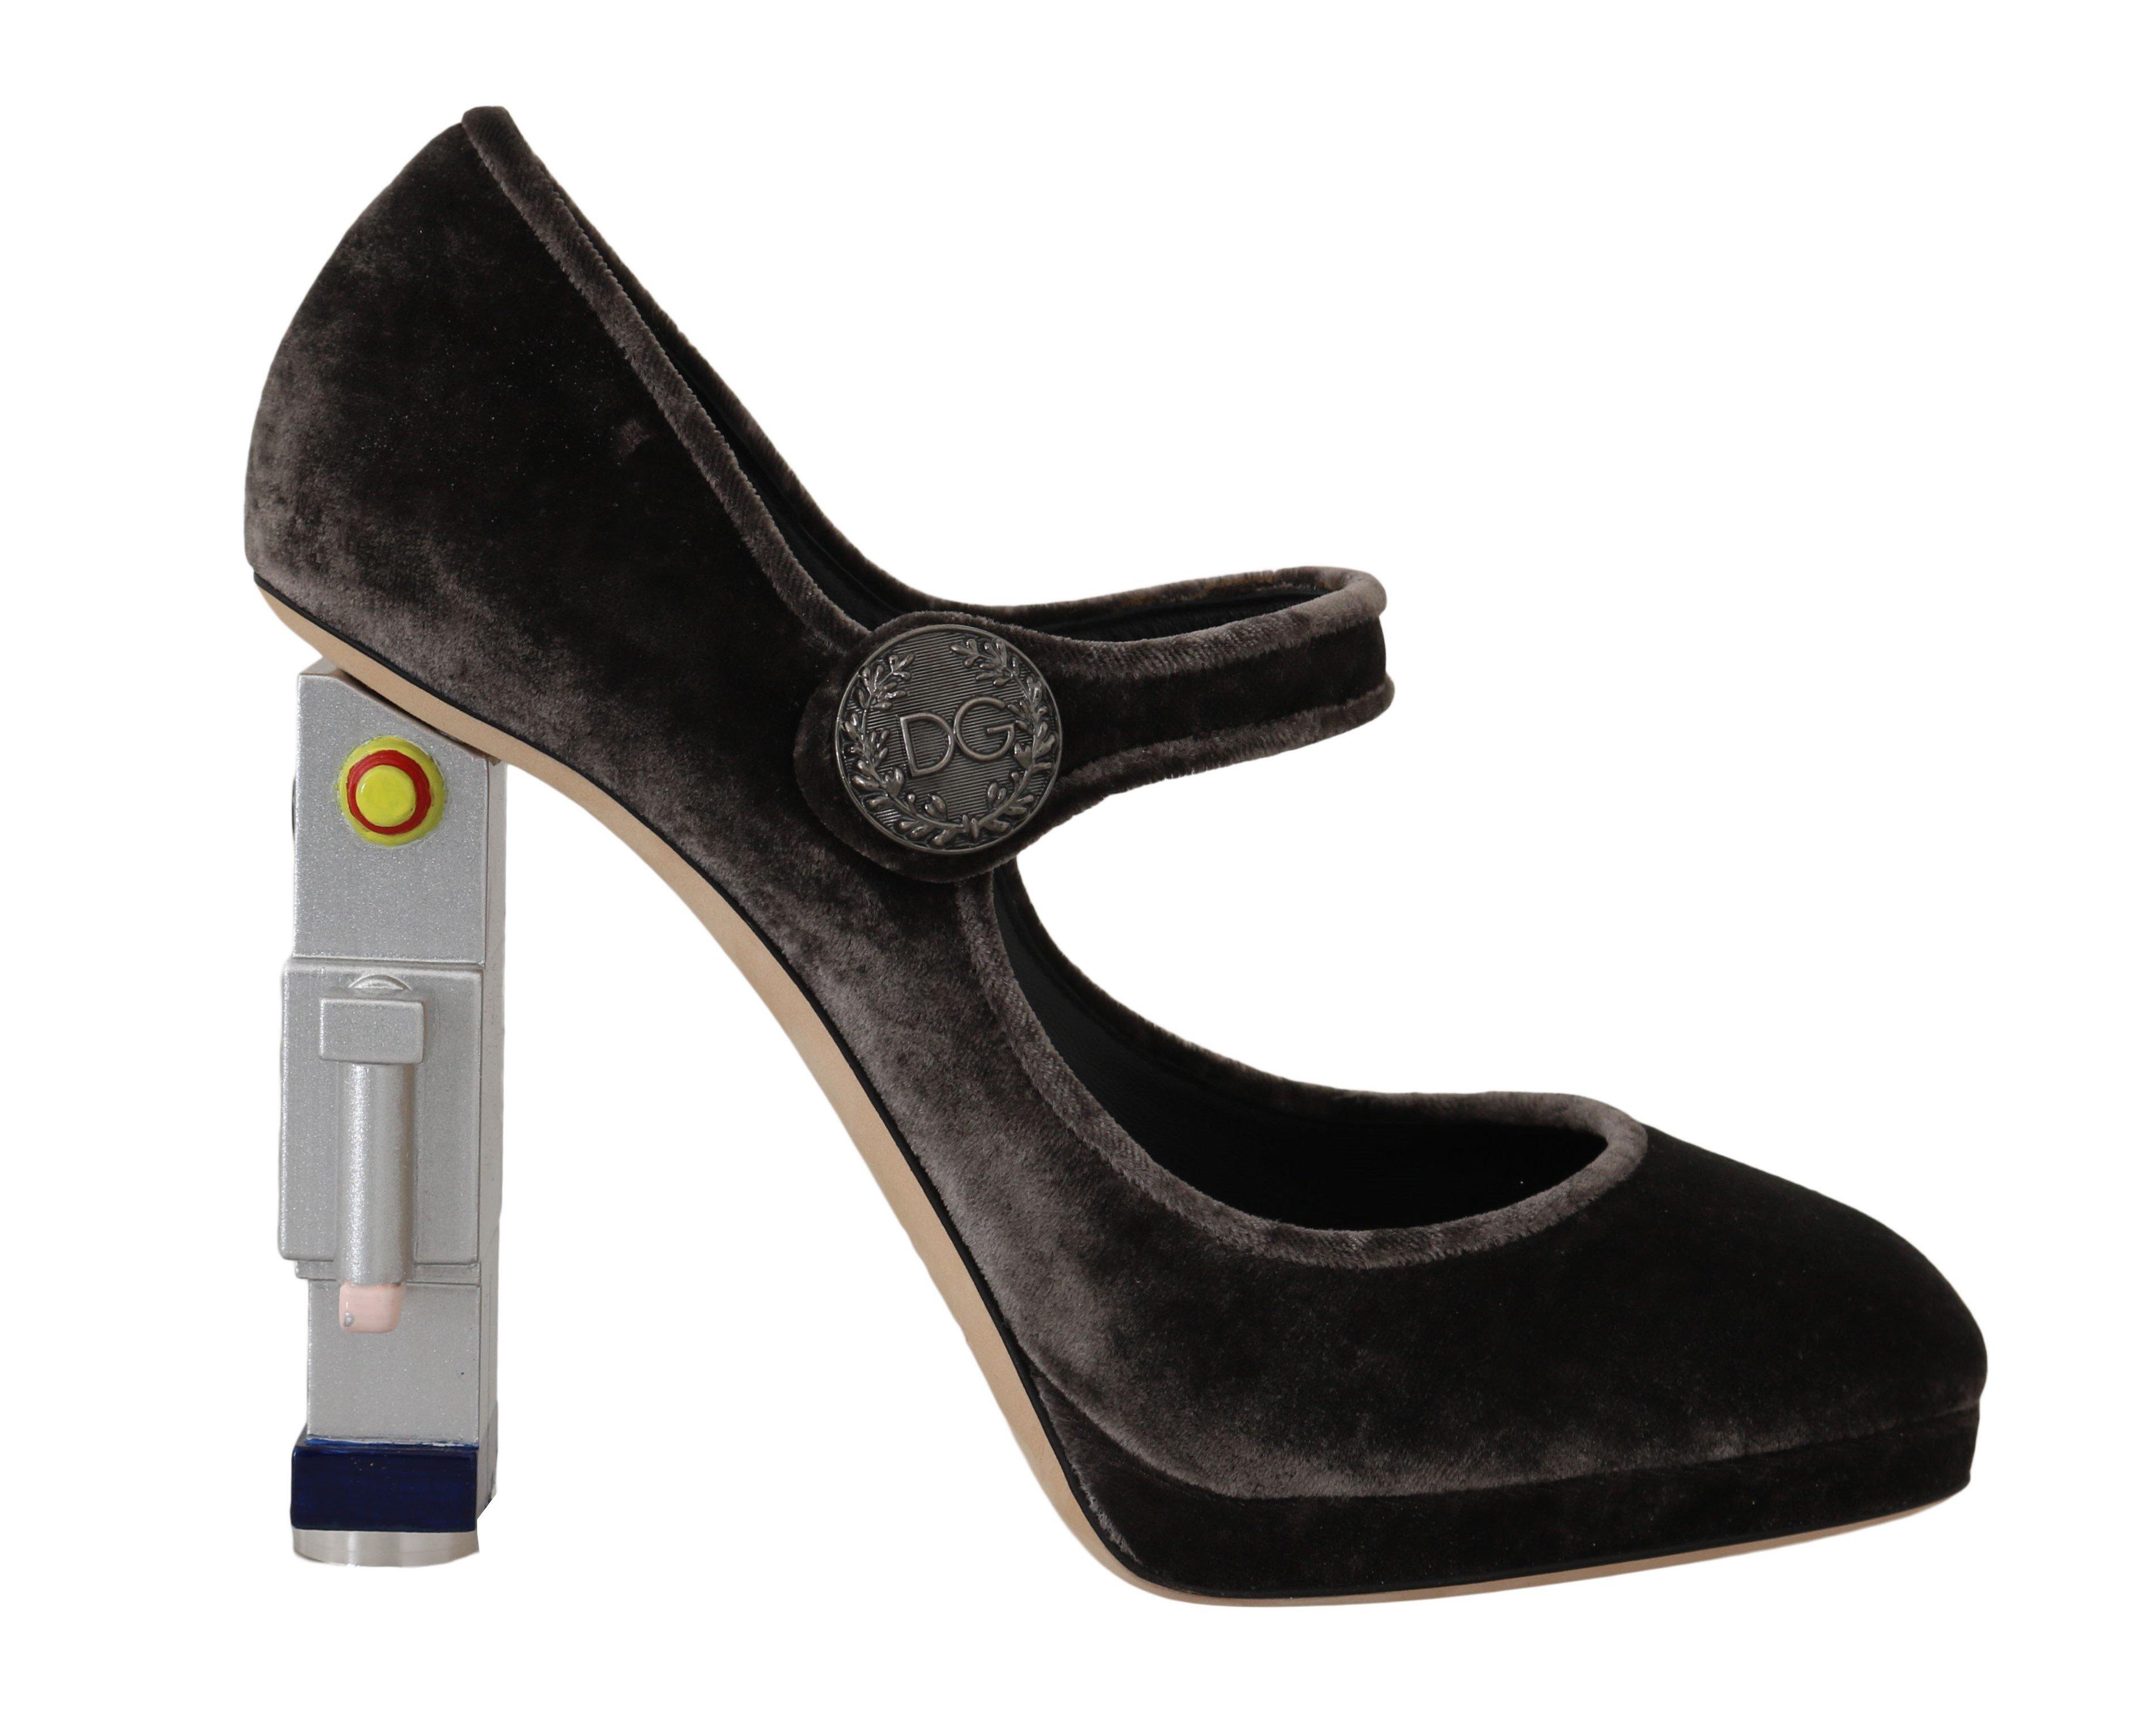 Dolce & Gabbana Women's Velvet Robot Mary Janes Heels Gray LA4540 - EU40/US9.5